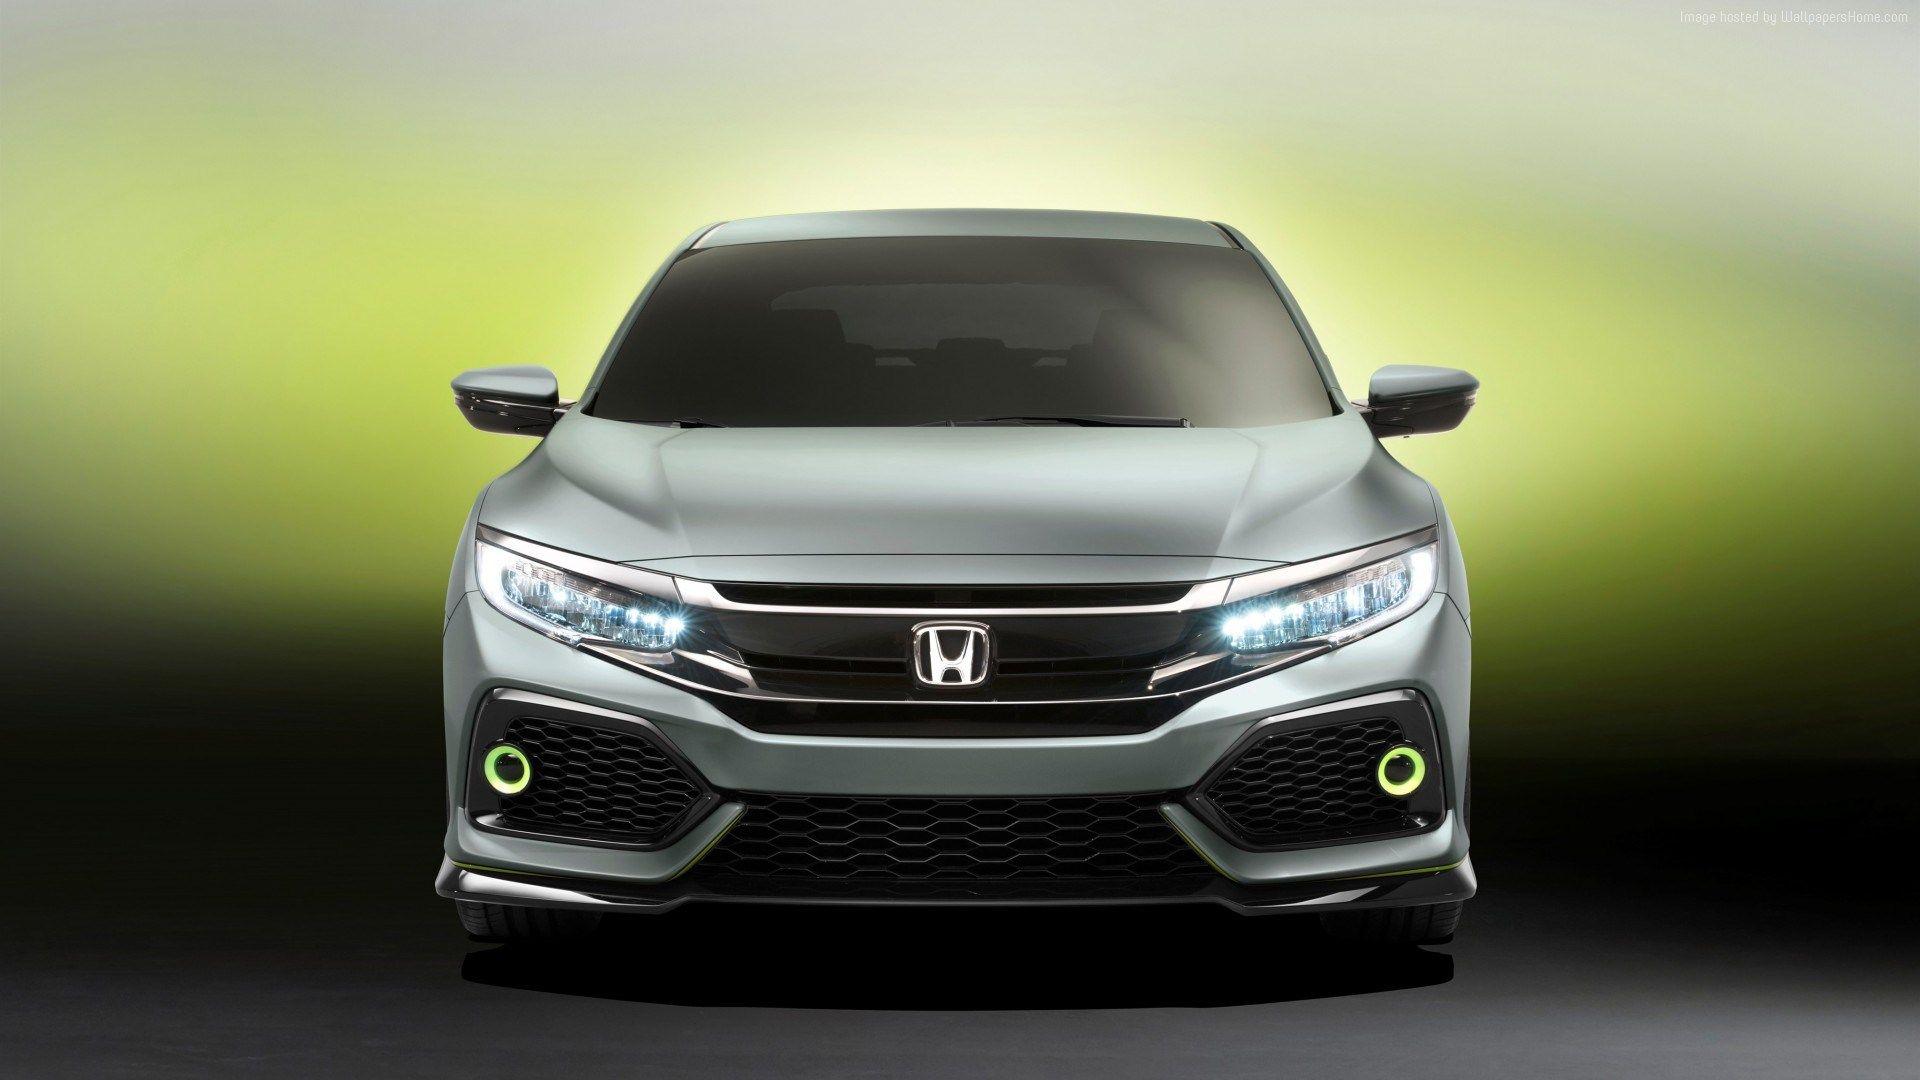 honda civic hatchback prototype wallpaper Civic